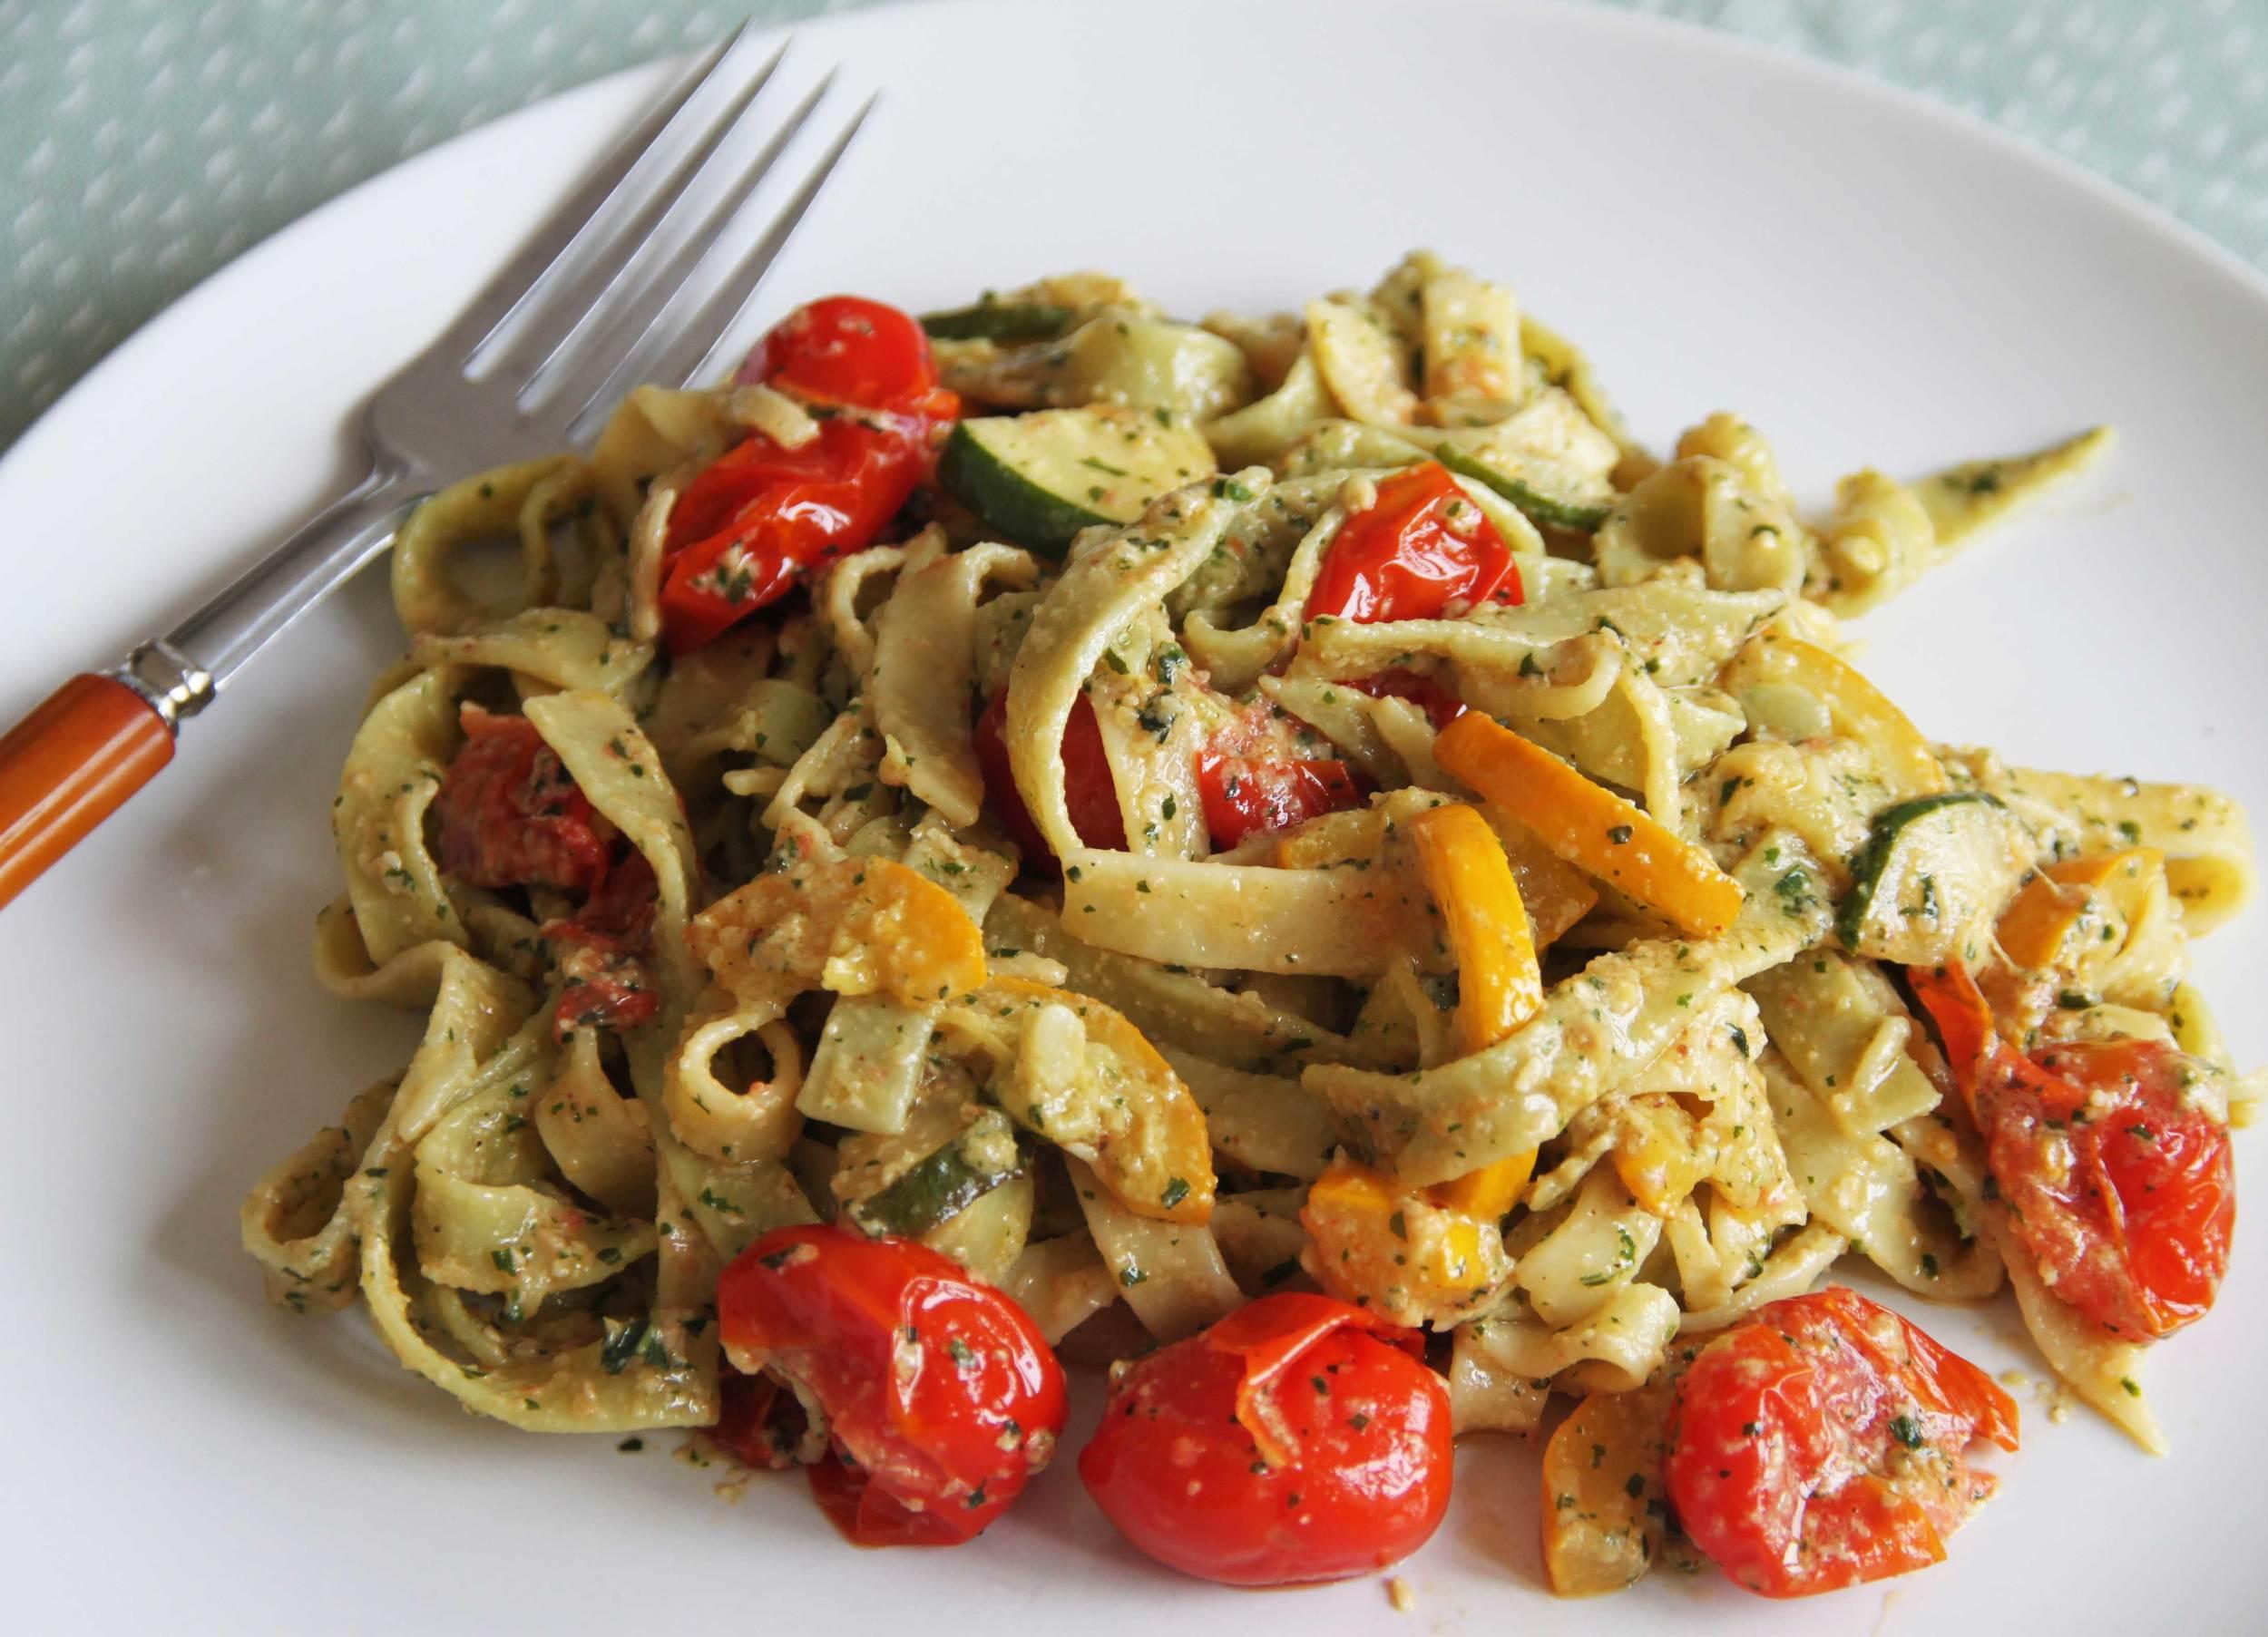 Creamy Pesto Pasta with Vegetables